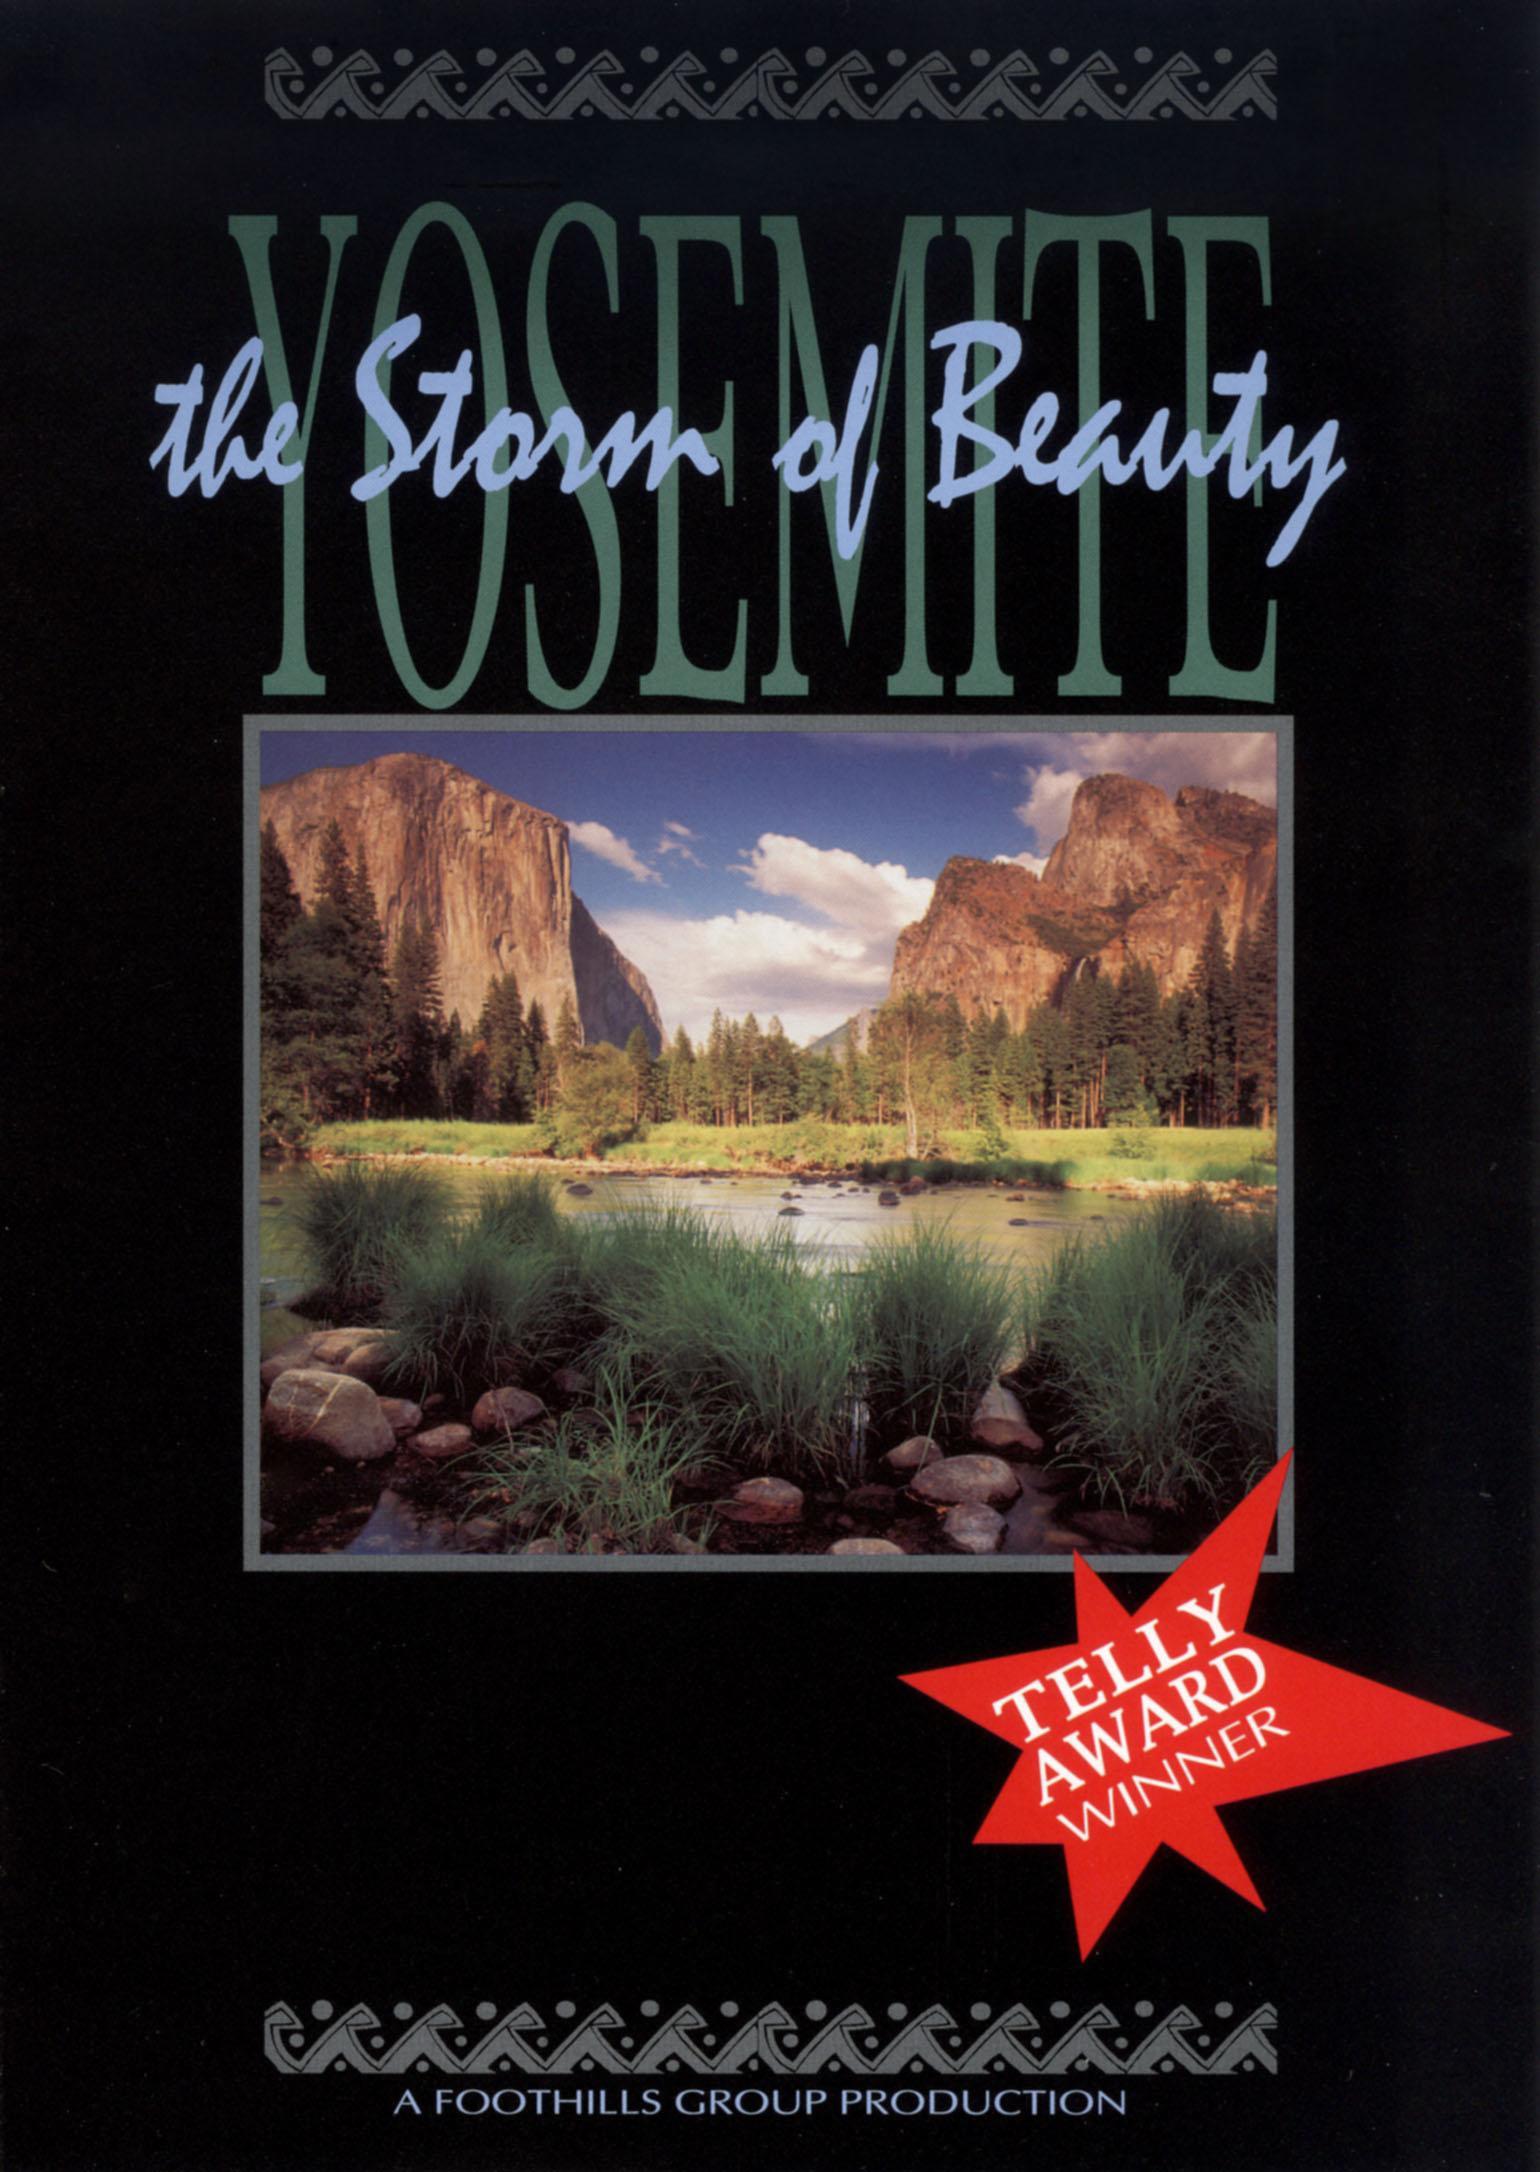 Yosemite: The Storm of Beauty